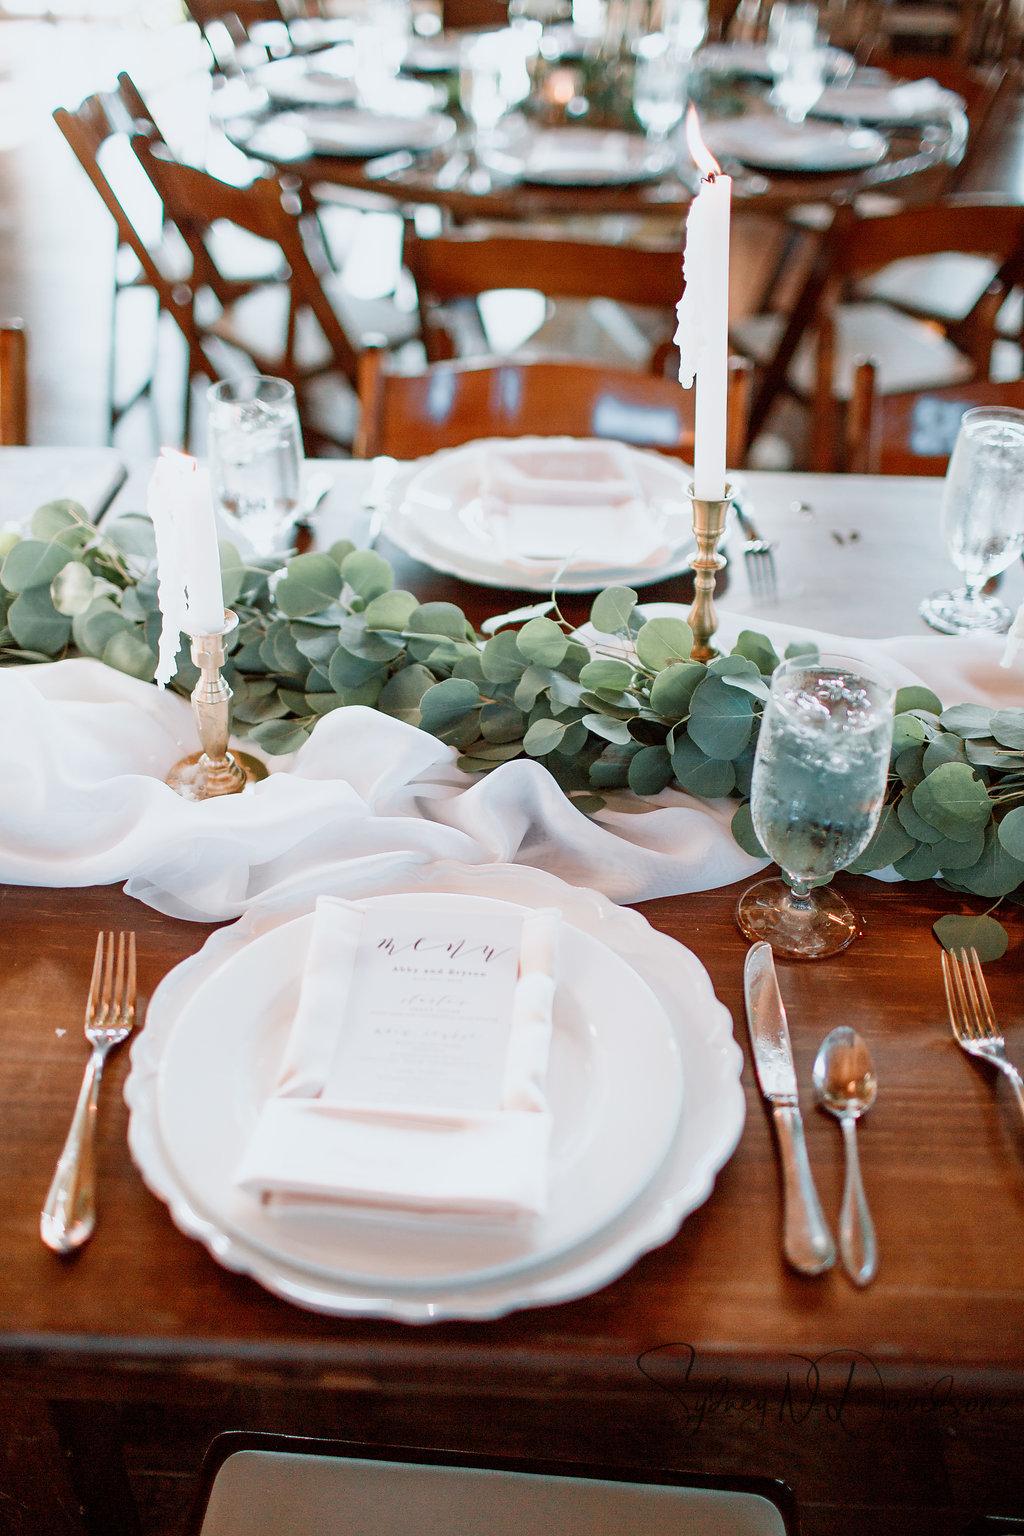 sydney-davidson-wedding-stillwater-oklahoma-wedding-session-traveling-photographer-portrait-tulsa-oklahoma-6690.jpg